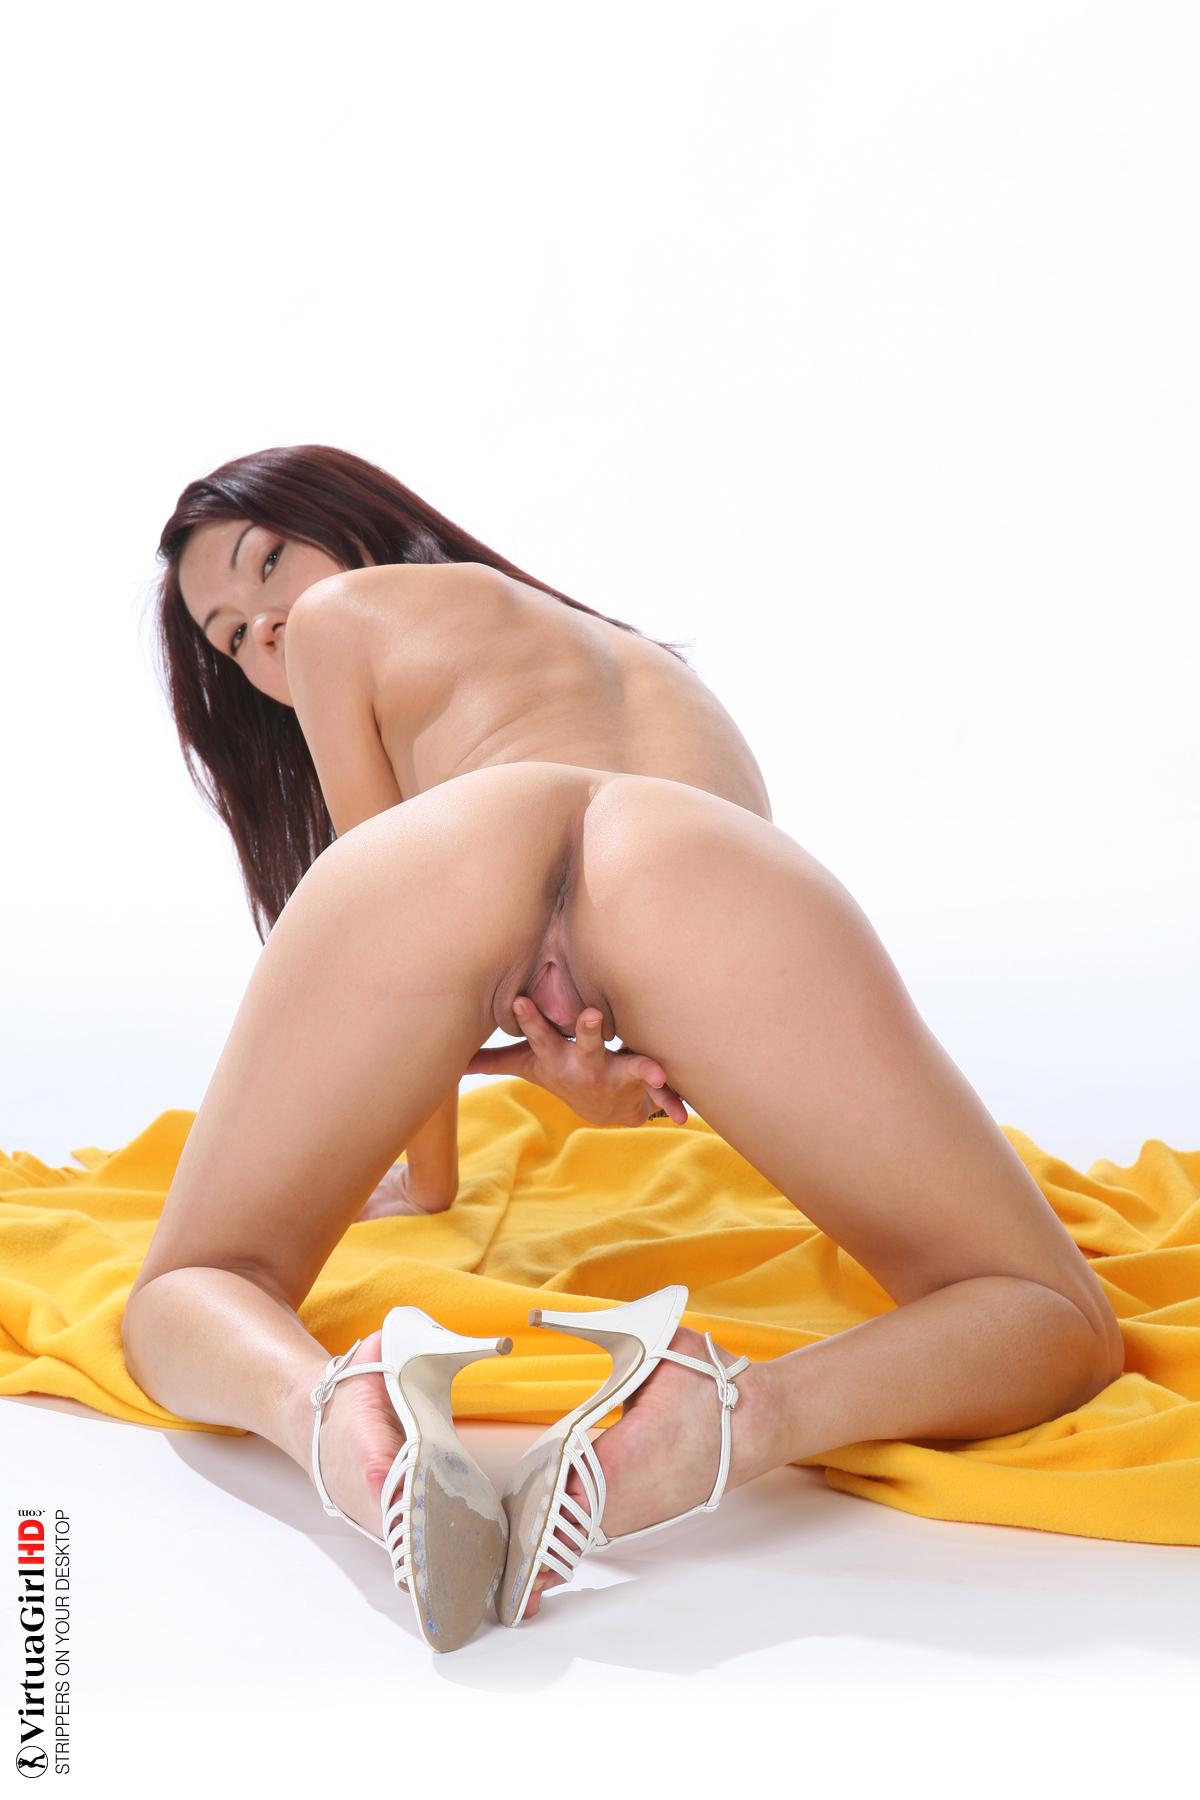 girls stripping and masterbating